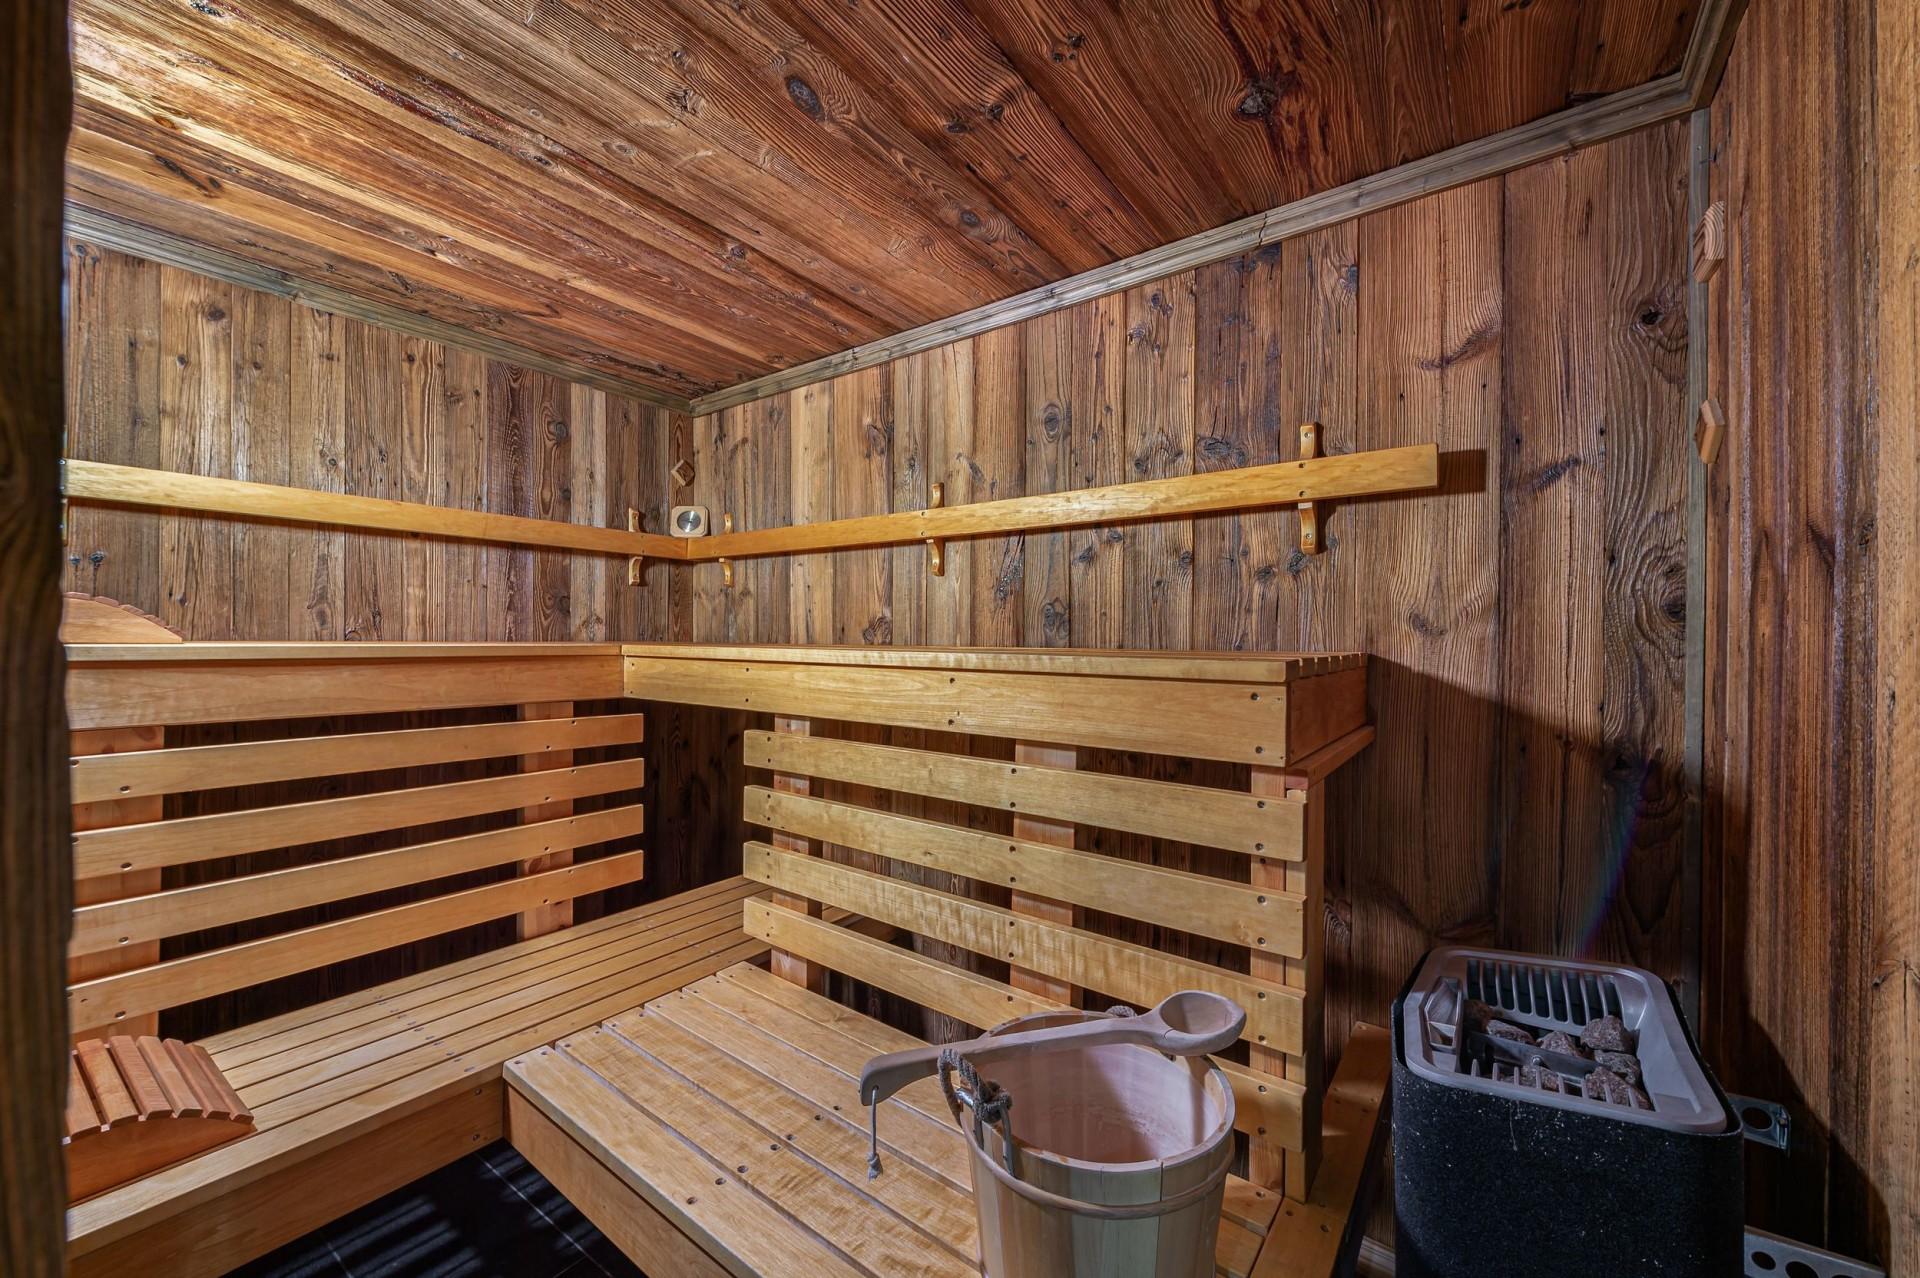 Courchevel 1300 Location Chalet Luxe Noubate Sauna